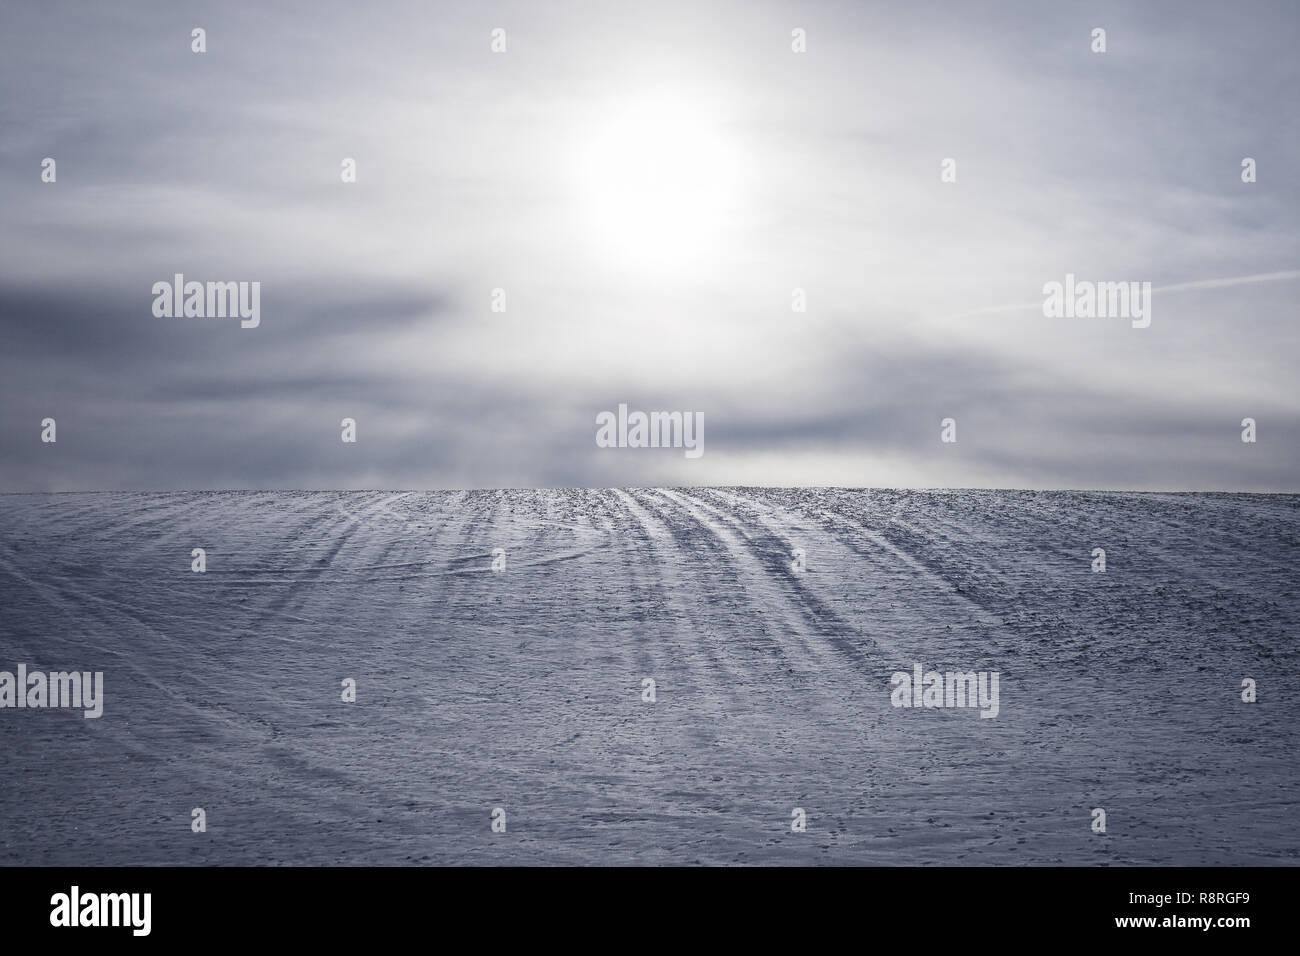 Cerro Nevado Imagen De Stock